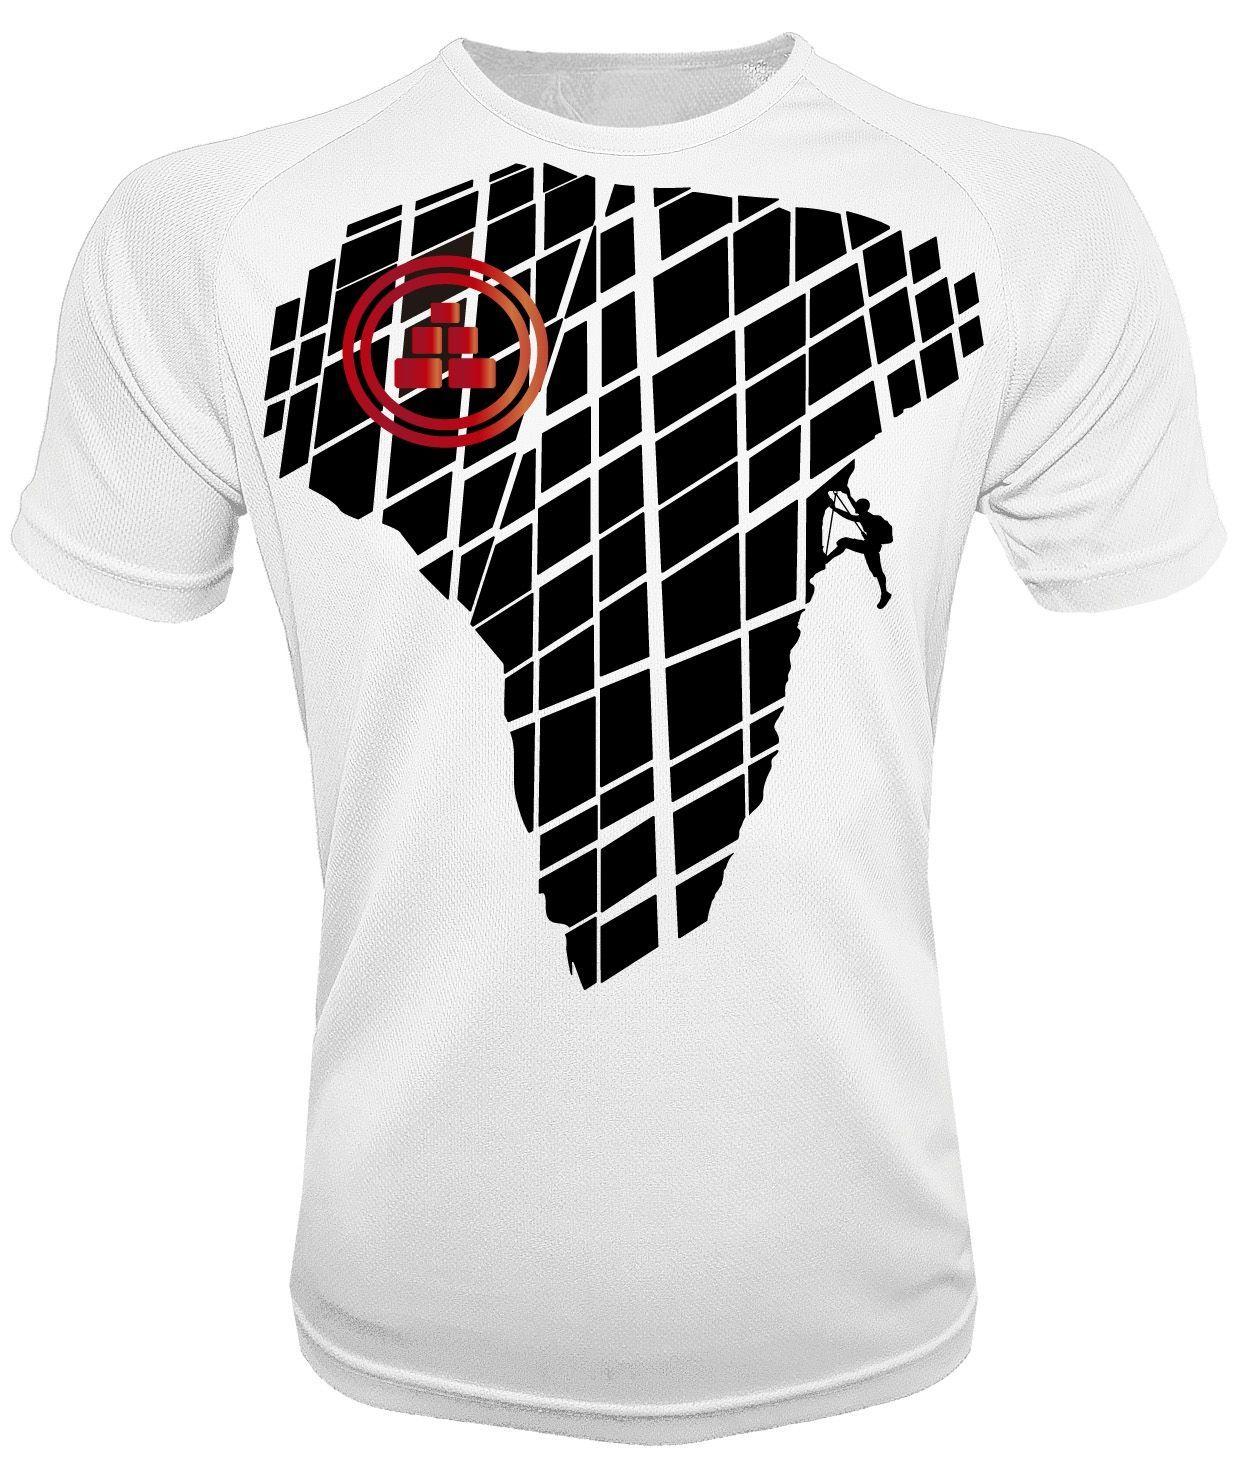 Camiseta deportiva montaña B